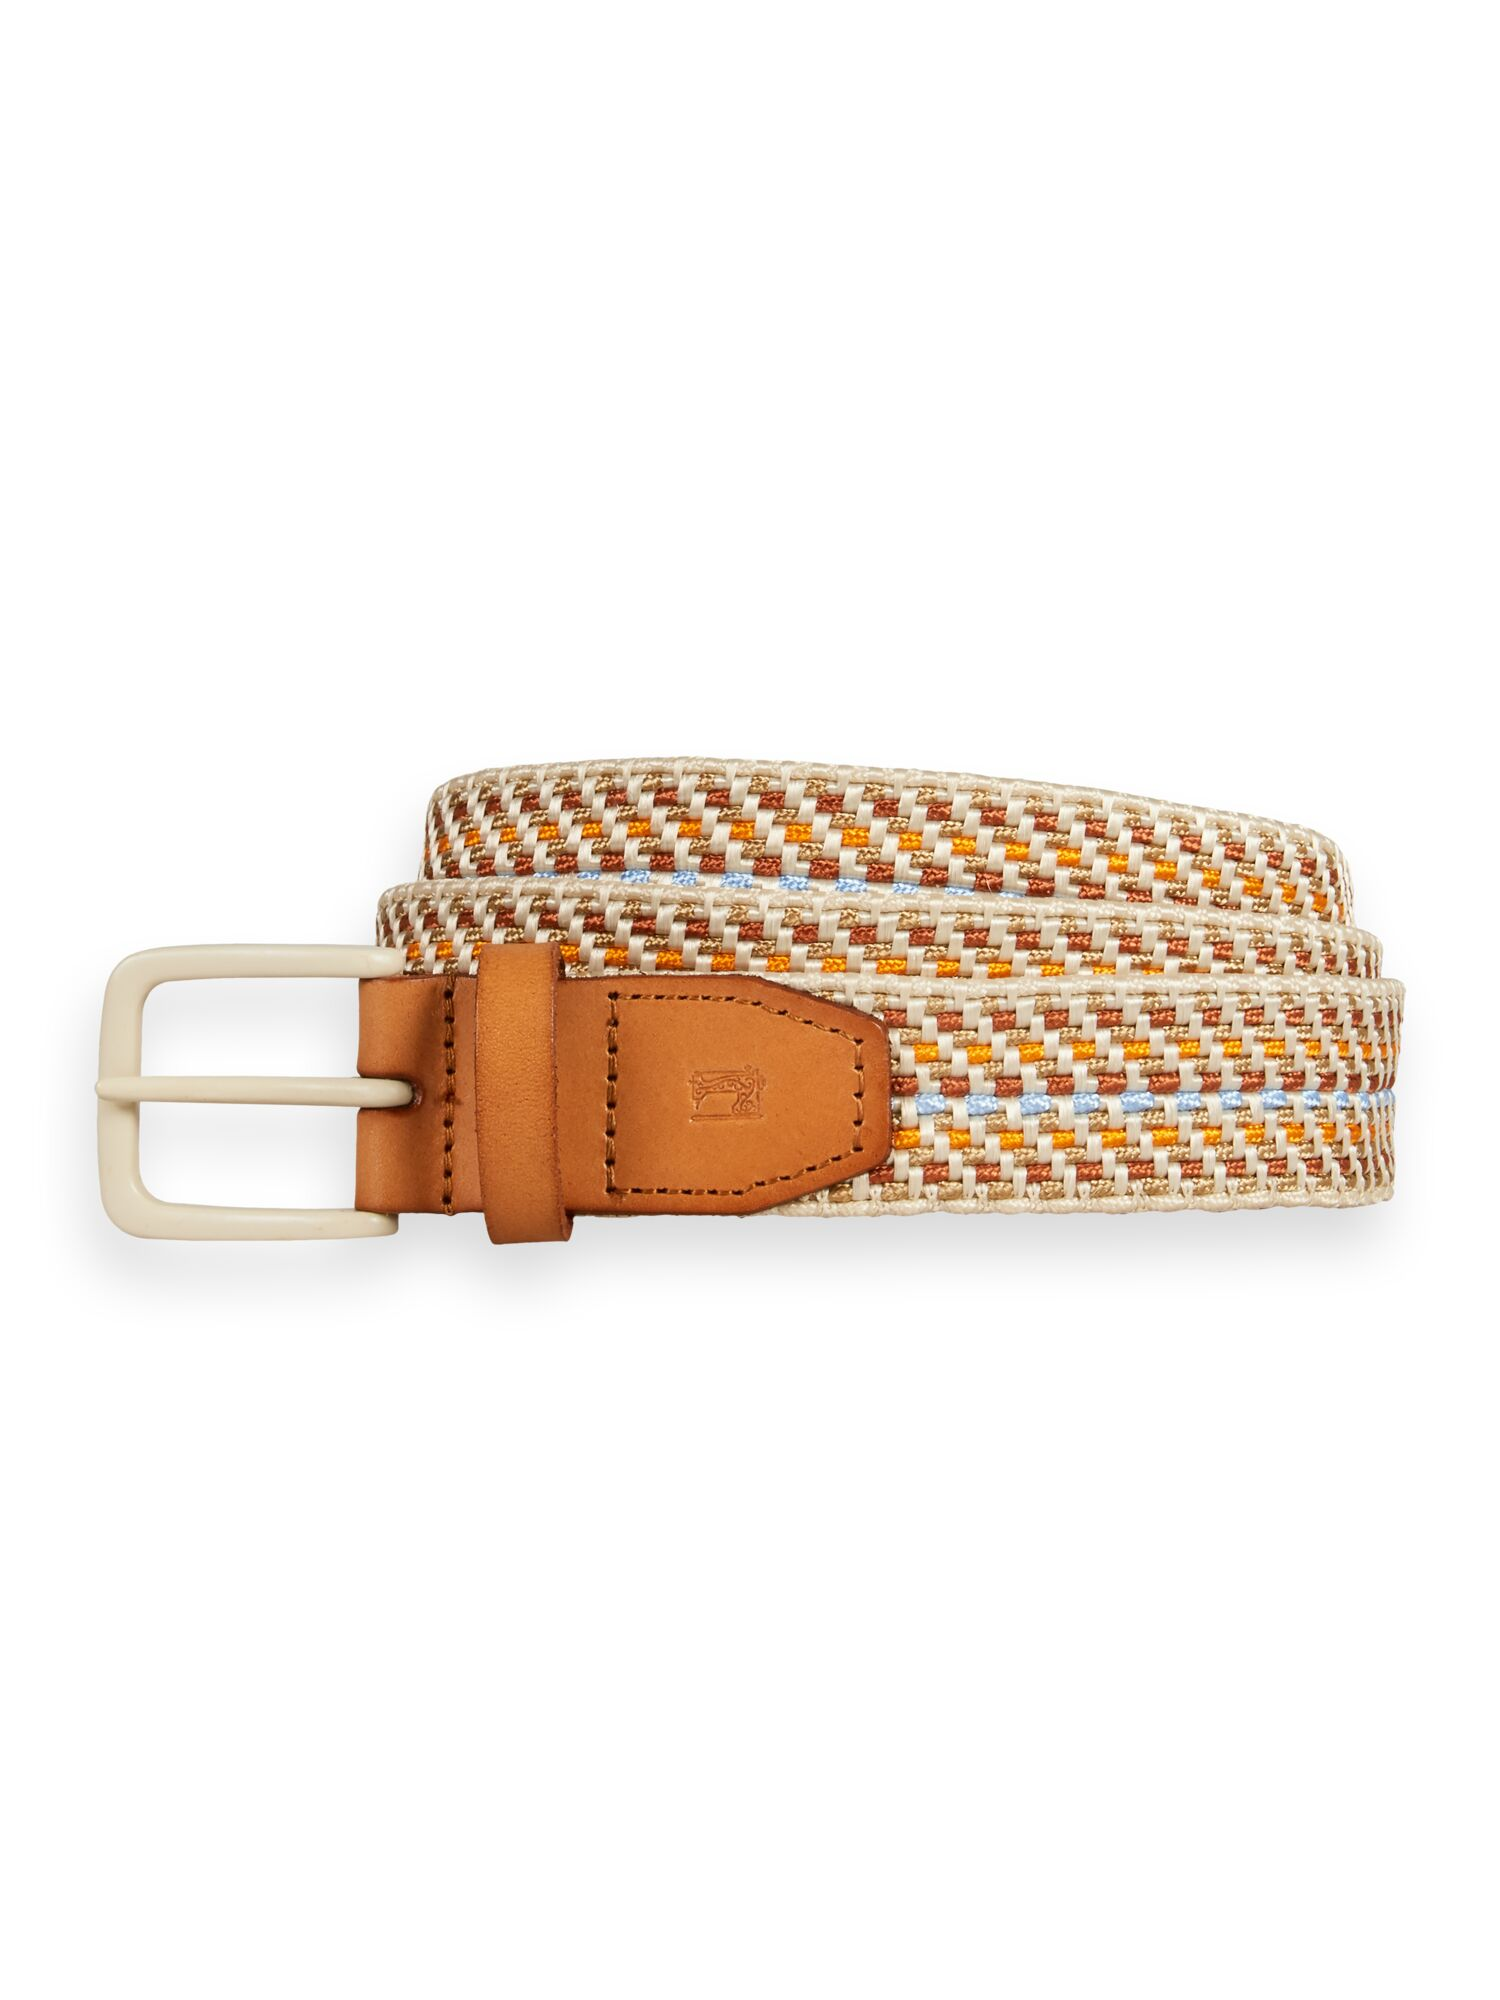 Scotch & Soda   Leather-trimmed woven tape belt